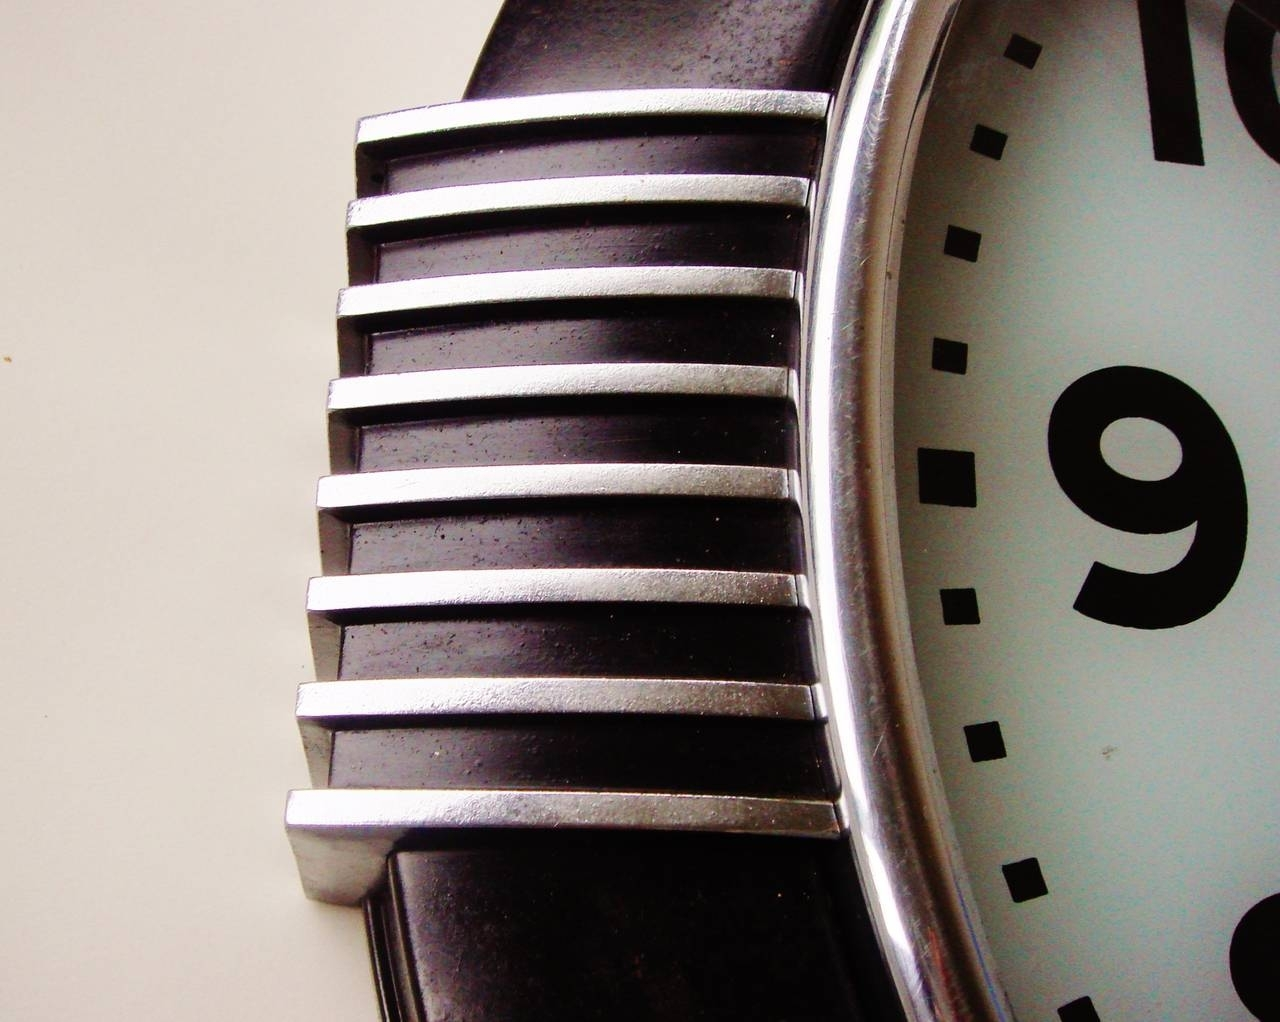 Large American Art Deco Chrome And Black Illuminated Dial Wall Clock regarding Art Deco Wall Clock (Image 13 of 20)